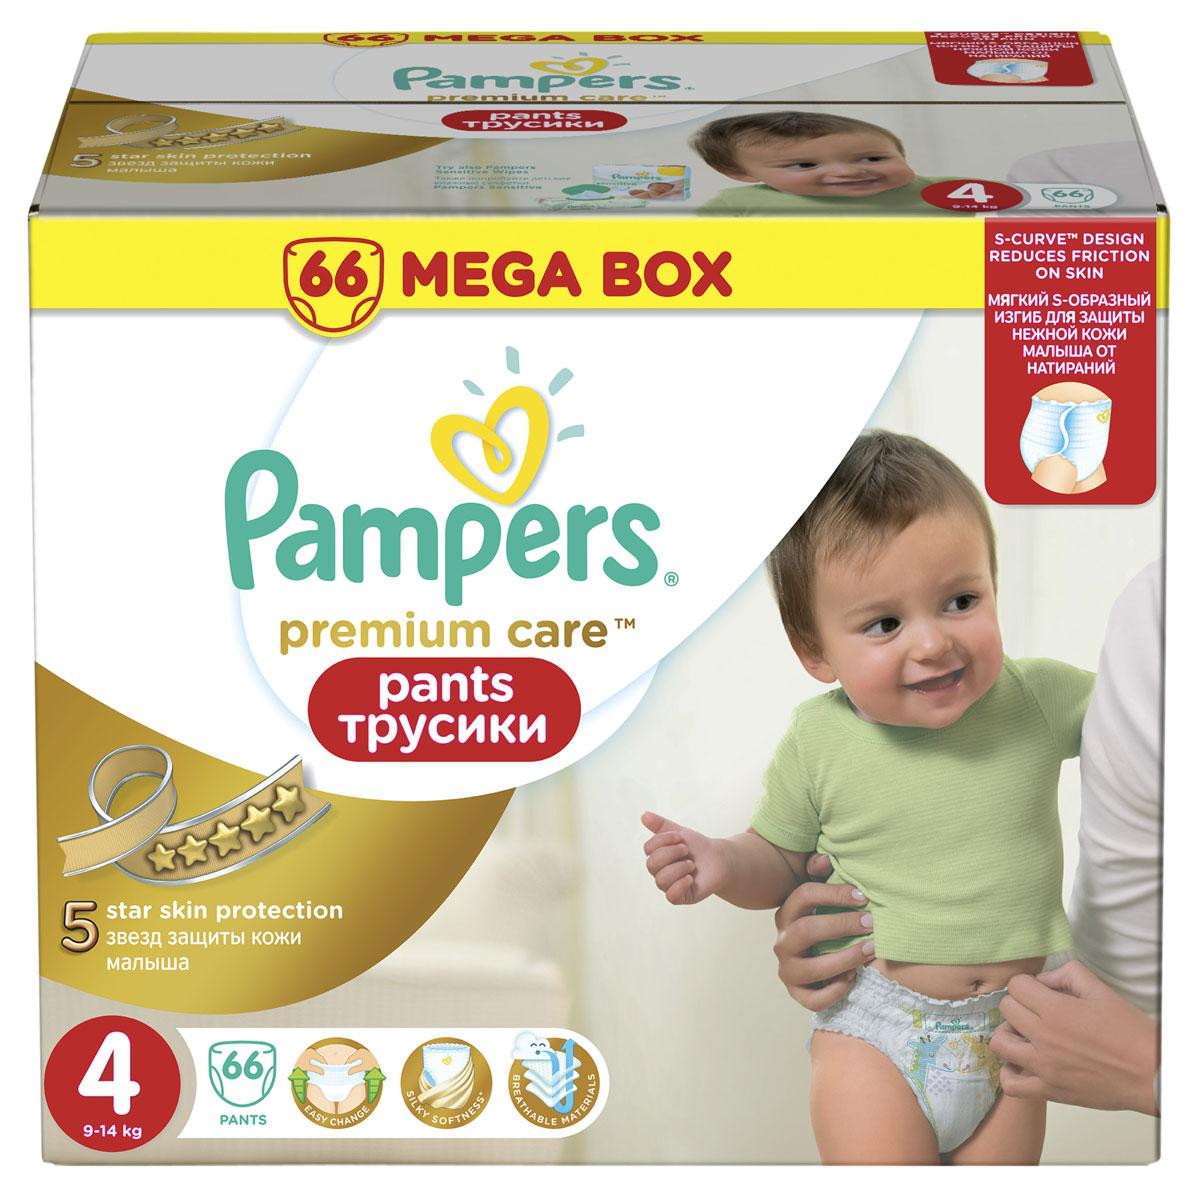 Pampers Pants Трусики Premium Care 9-14 кг (размер 4) 66 шт